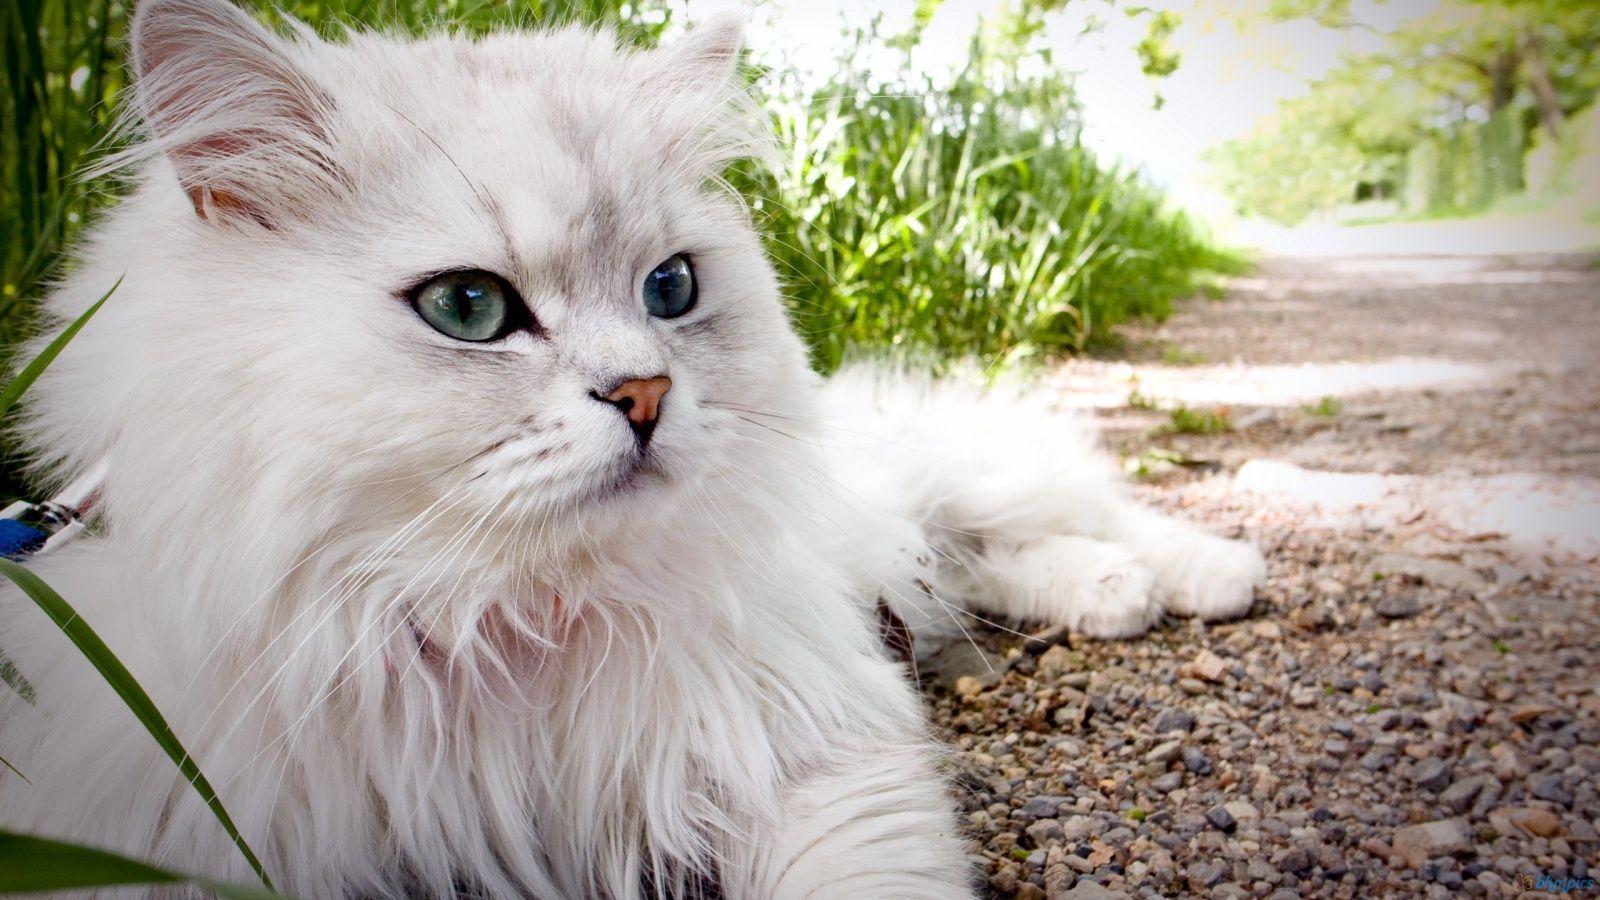 Persian Cat Wallpapers Top Free Persian Cat Backgrounds Wallpaperaccess